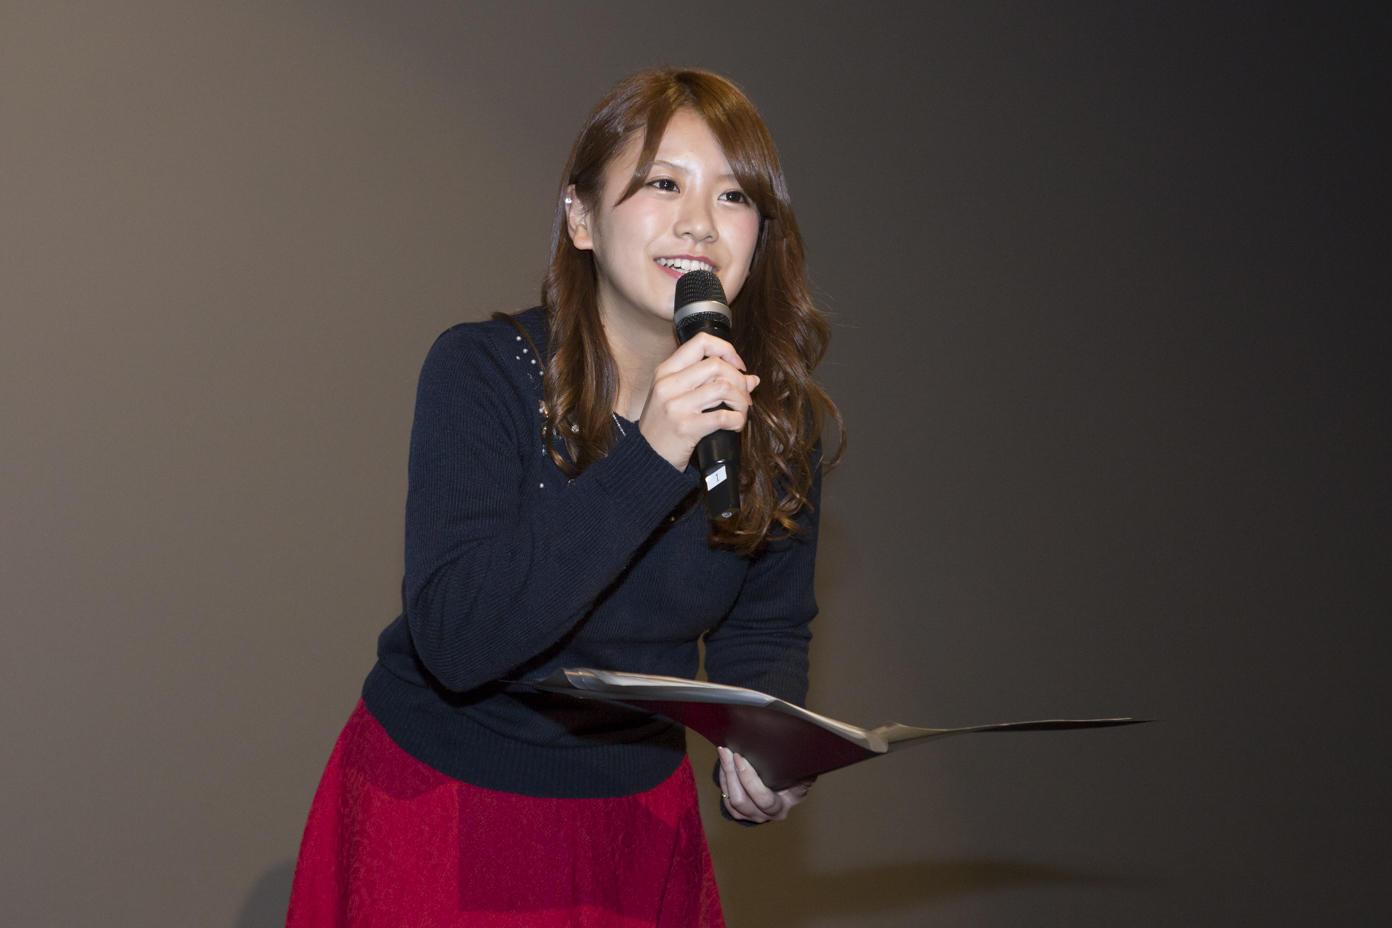 http://news.yoshimoto.co.jp/20160116175623-d6eac05c04295de5a5e044fd6cbb1b1c5d9faf75.jpg